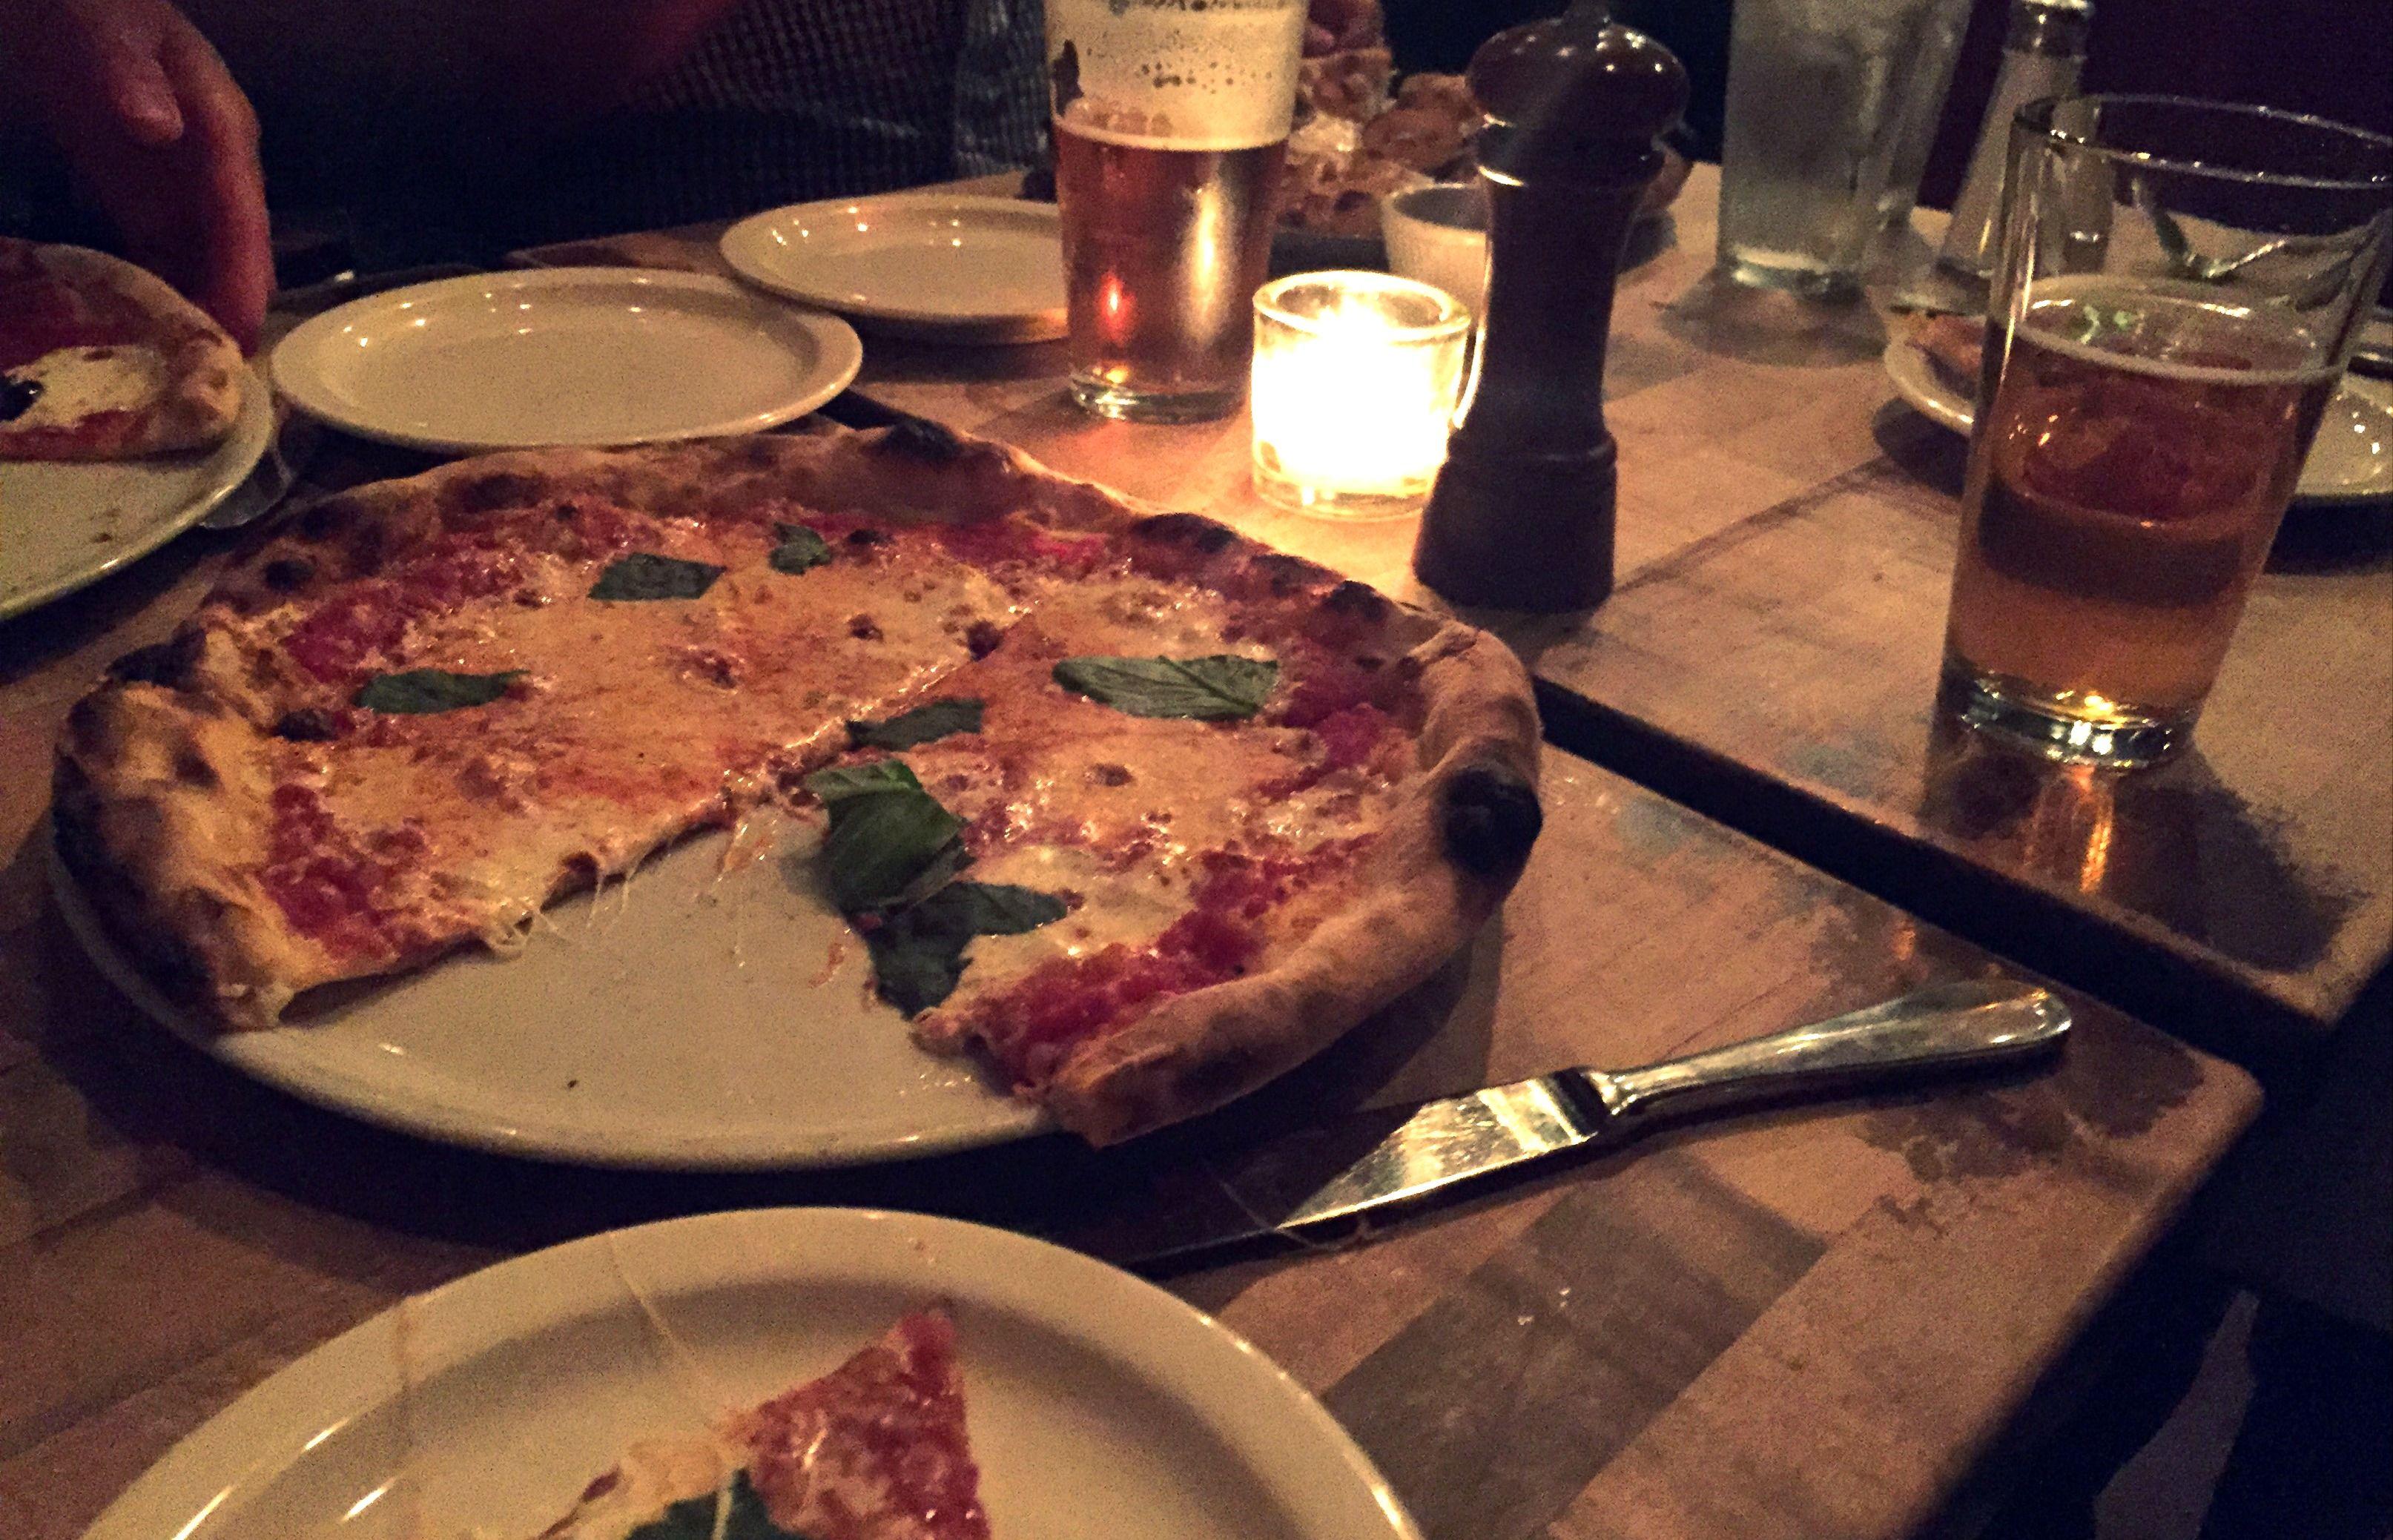 Pizzeria Bianco Phoenix margherita pizza [OC] [29681965] #foodporn #food #foodie #yummy #yum #foodgasm #nomnom #delicious #recipe